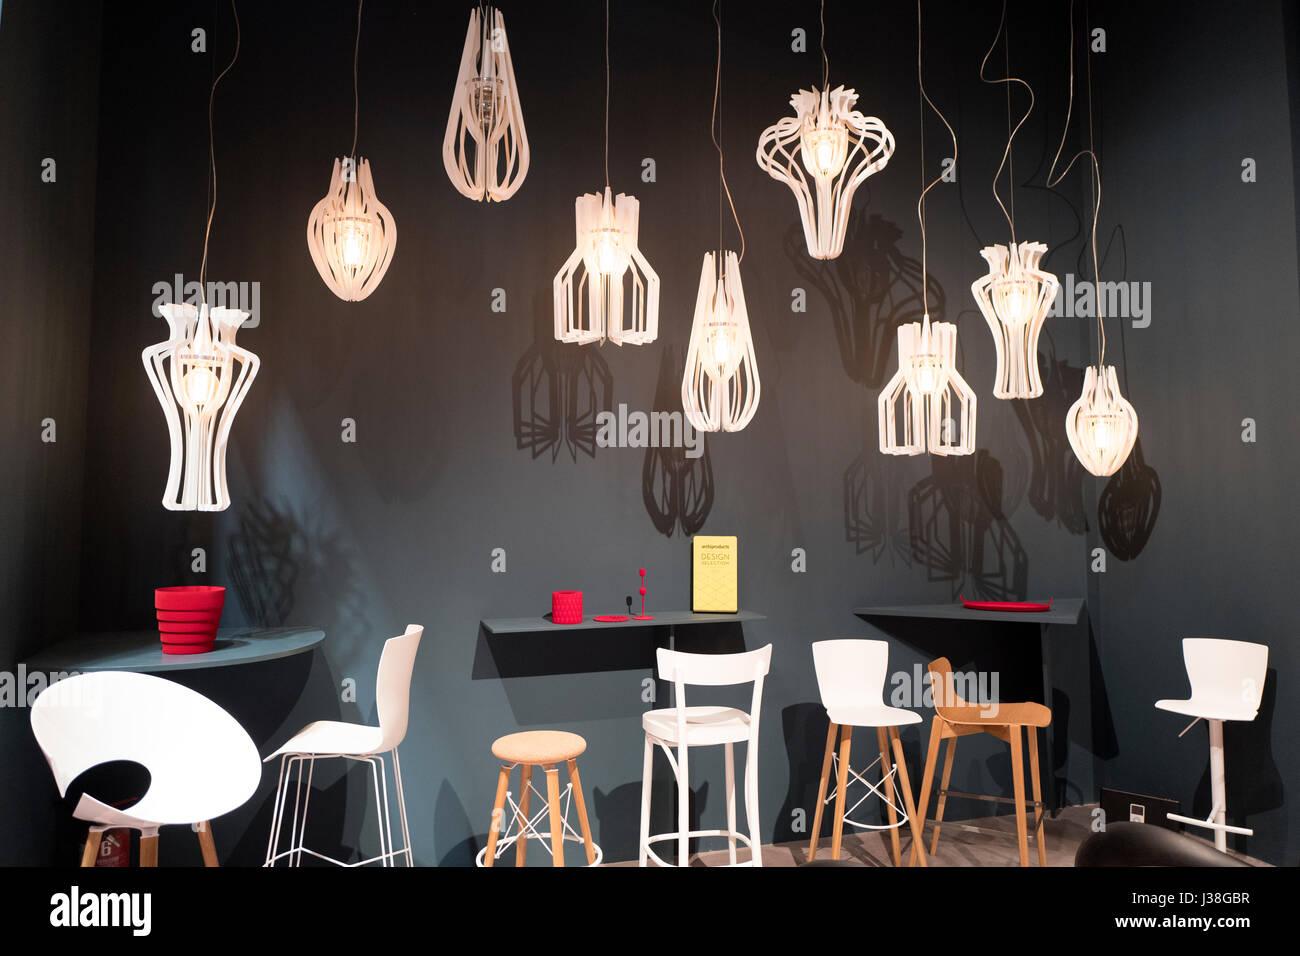 Milan April, 2017: Interior Design Furniture At The International Design  Week Salone Del Mobile, In Milan, Italy.